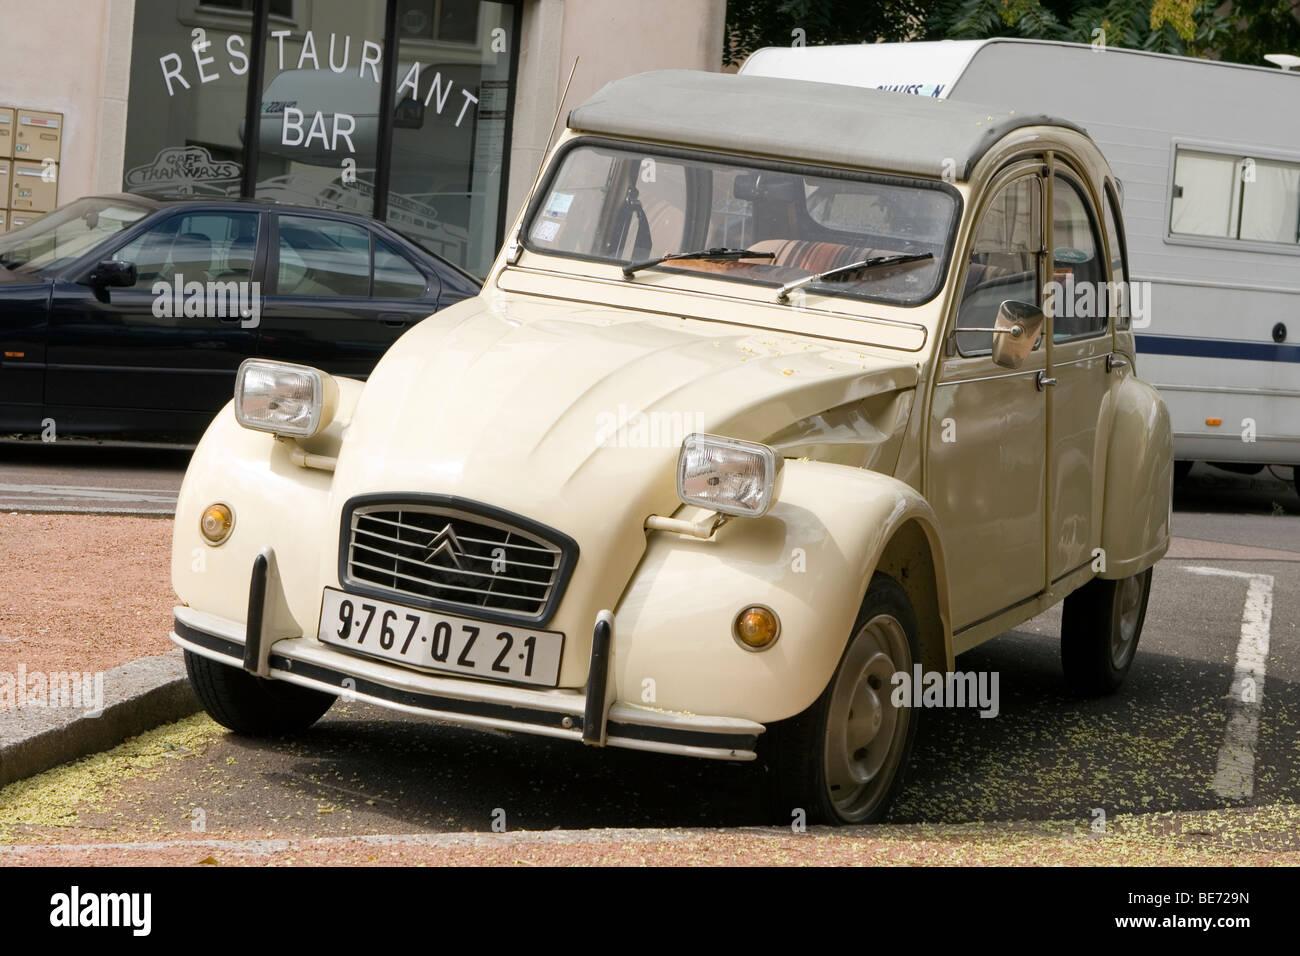 classic citroen 2cv vintage french car stock photos classic citroen 2cv vintage french car. Black Bedroom Furniture Sets. Home Design Ideas